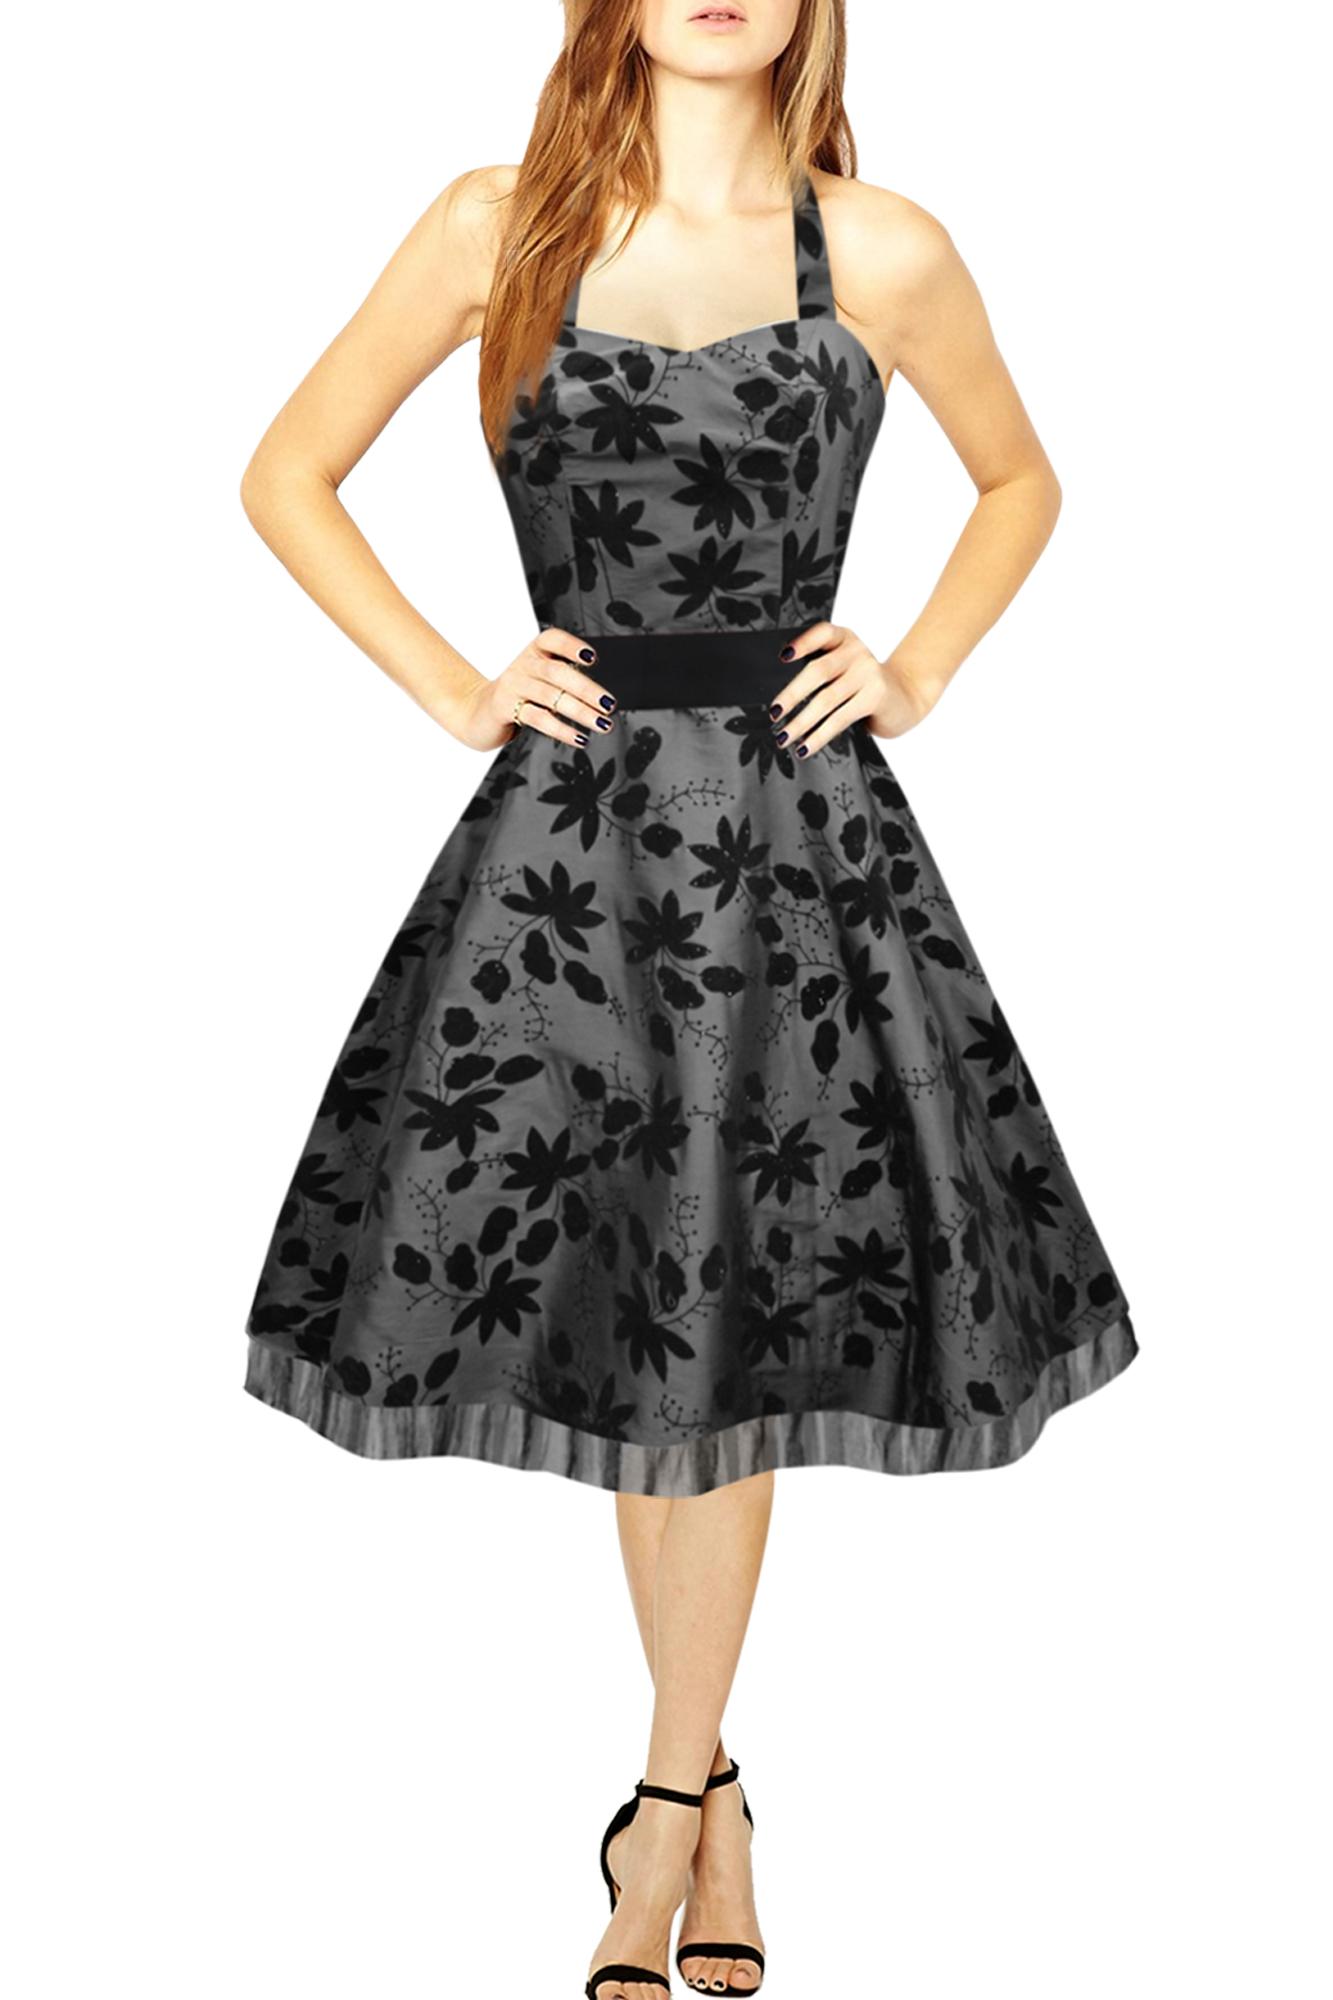 Maisy-Satin-Essence-50s-60s-Rockabilly-Vintage-Bridesmaid-Prom-Evening-Dress